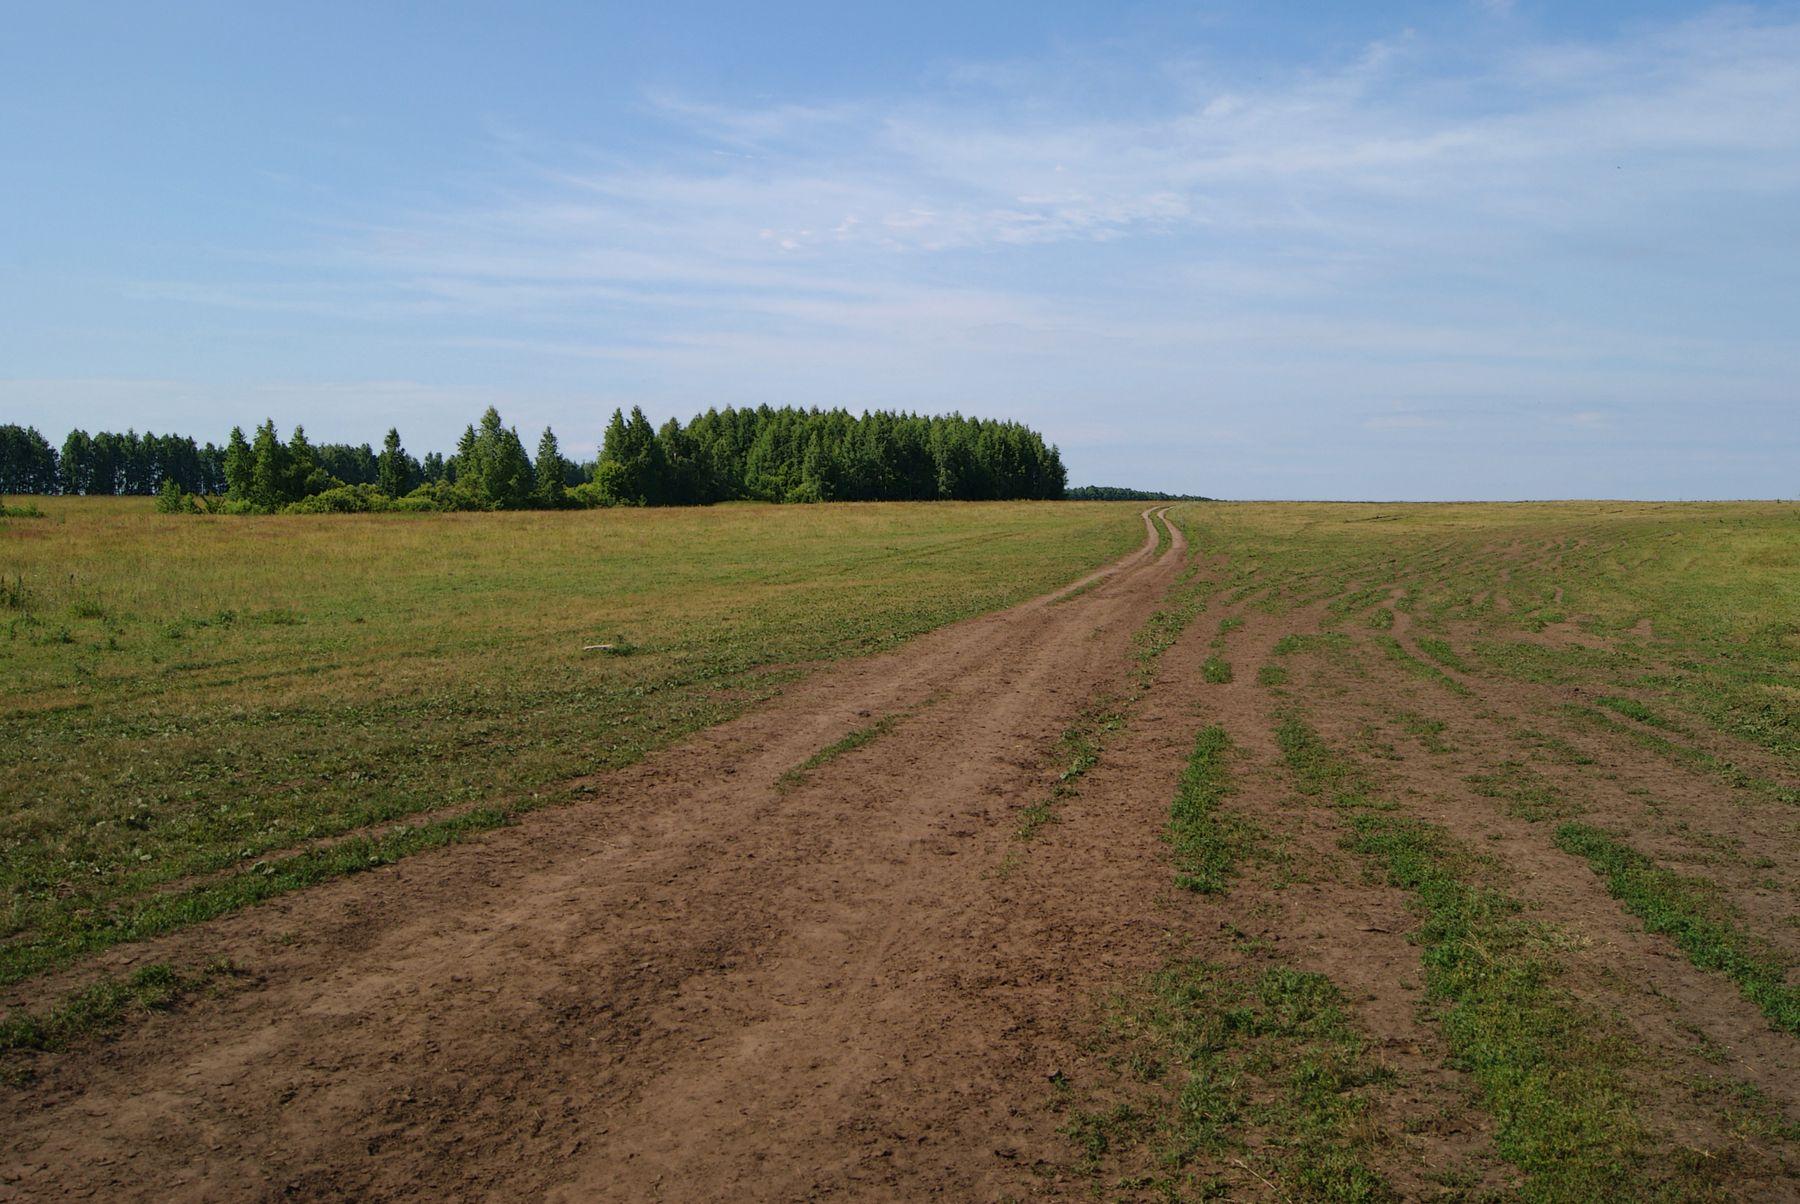 В даль уходит дорога лето лес пейзаж дорога